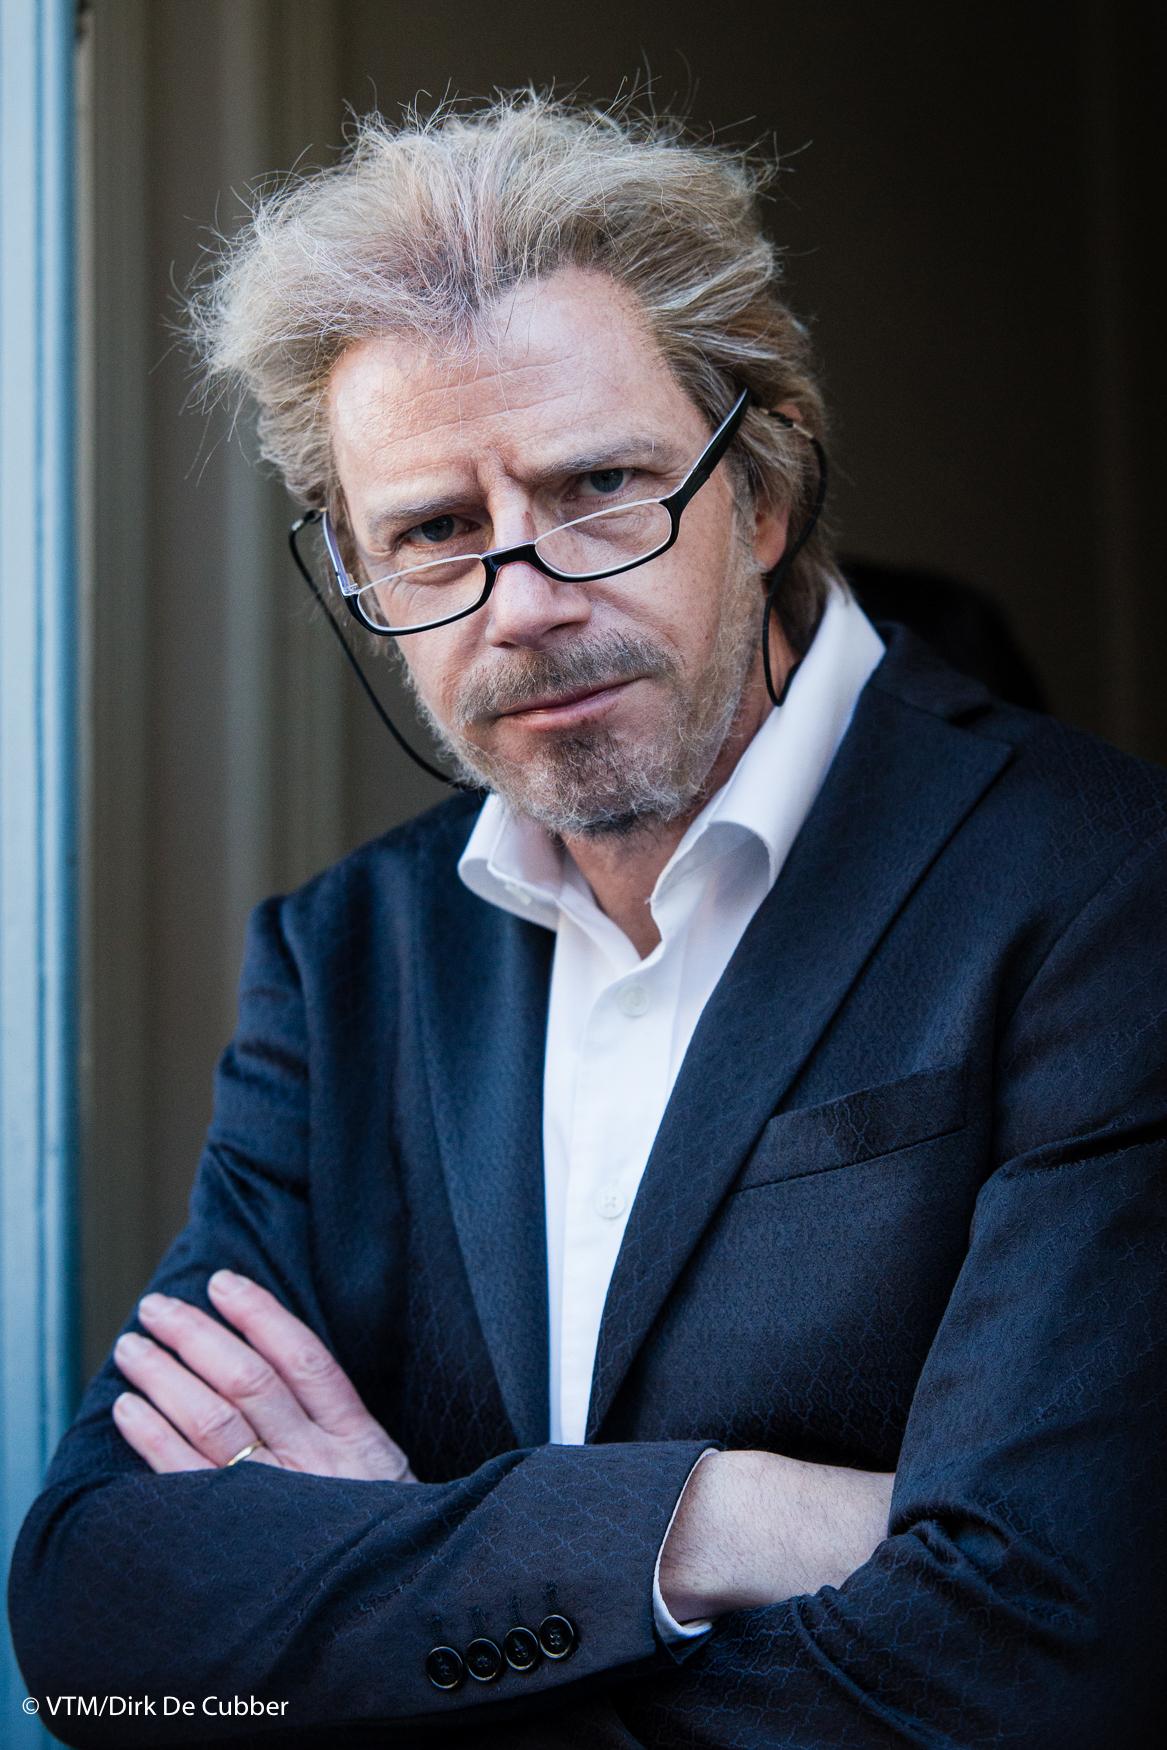 © VTM/Dirk De Cubber